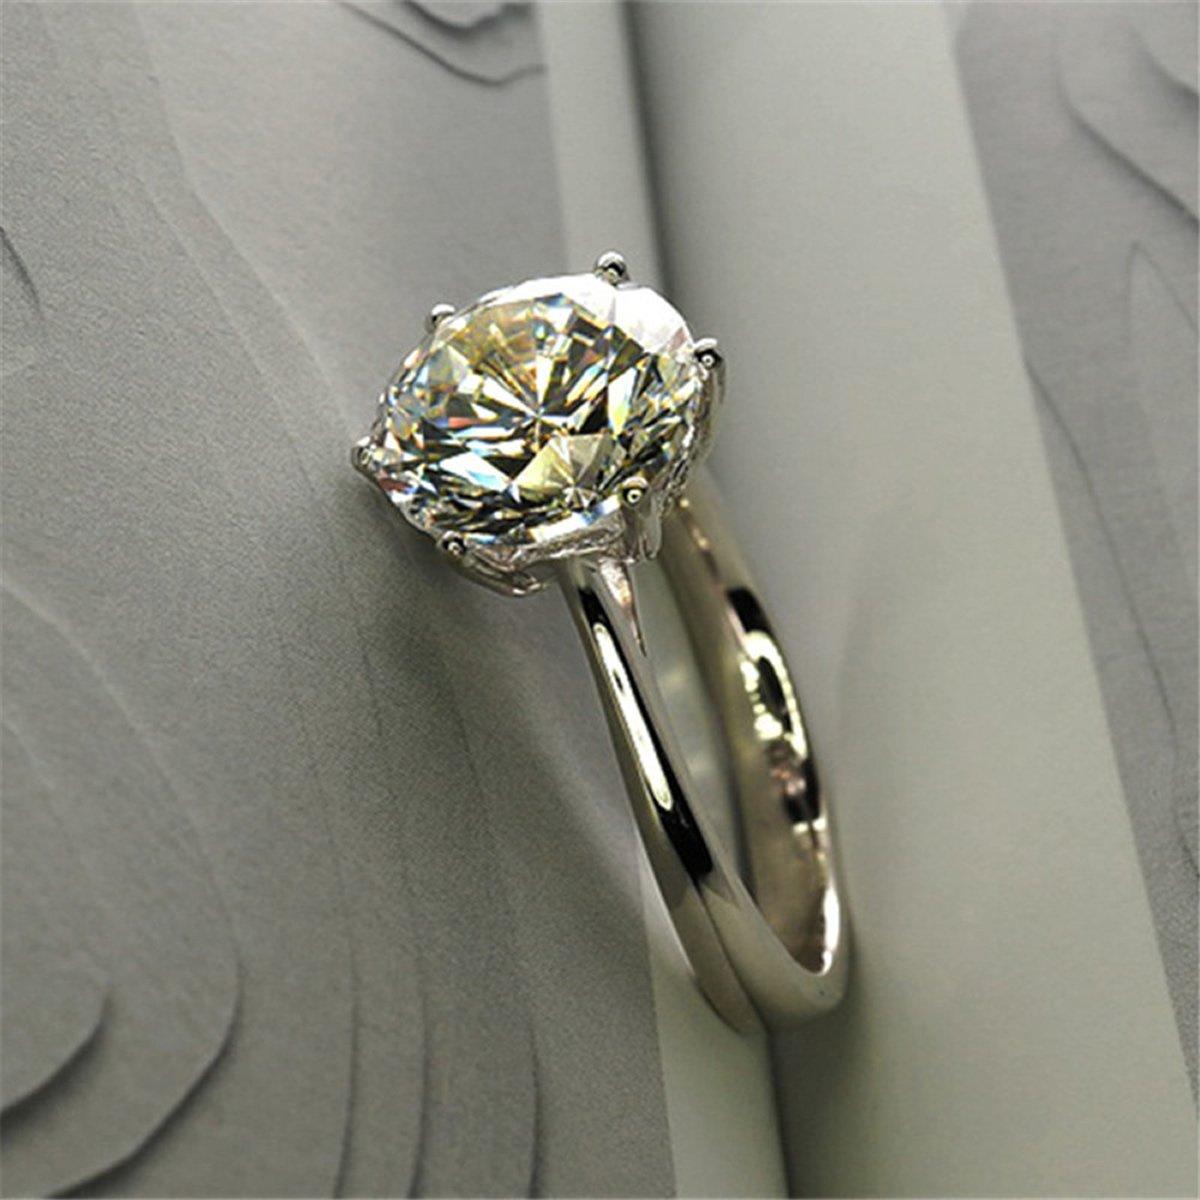 3310ceb8a Amazon.com: Erllo 4ct Round Brilliant Nscd Sona Simulated Diamond Solitaire Wedding  Engagement Ring - Finger Size 4-10: Jewelry